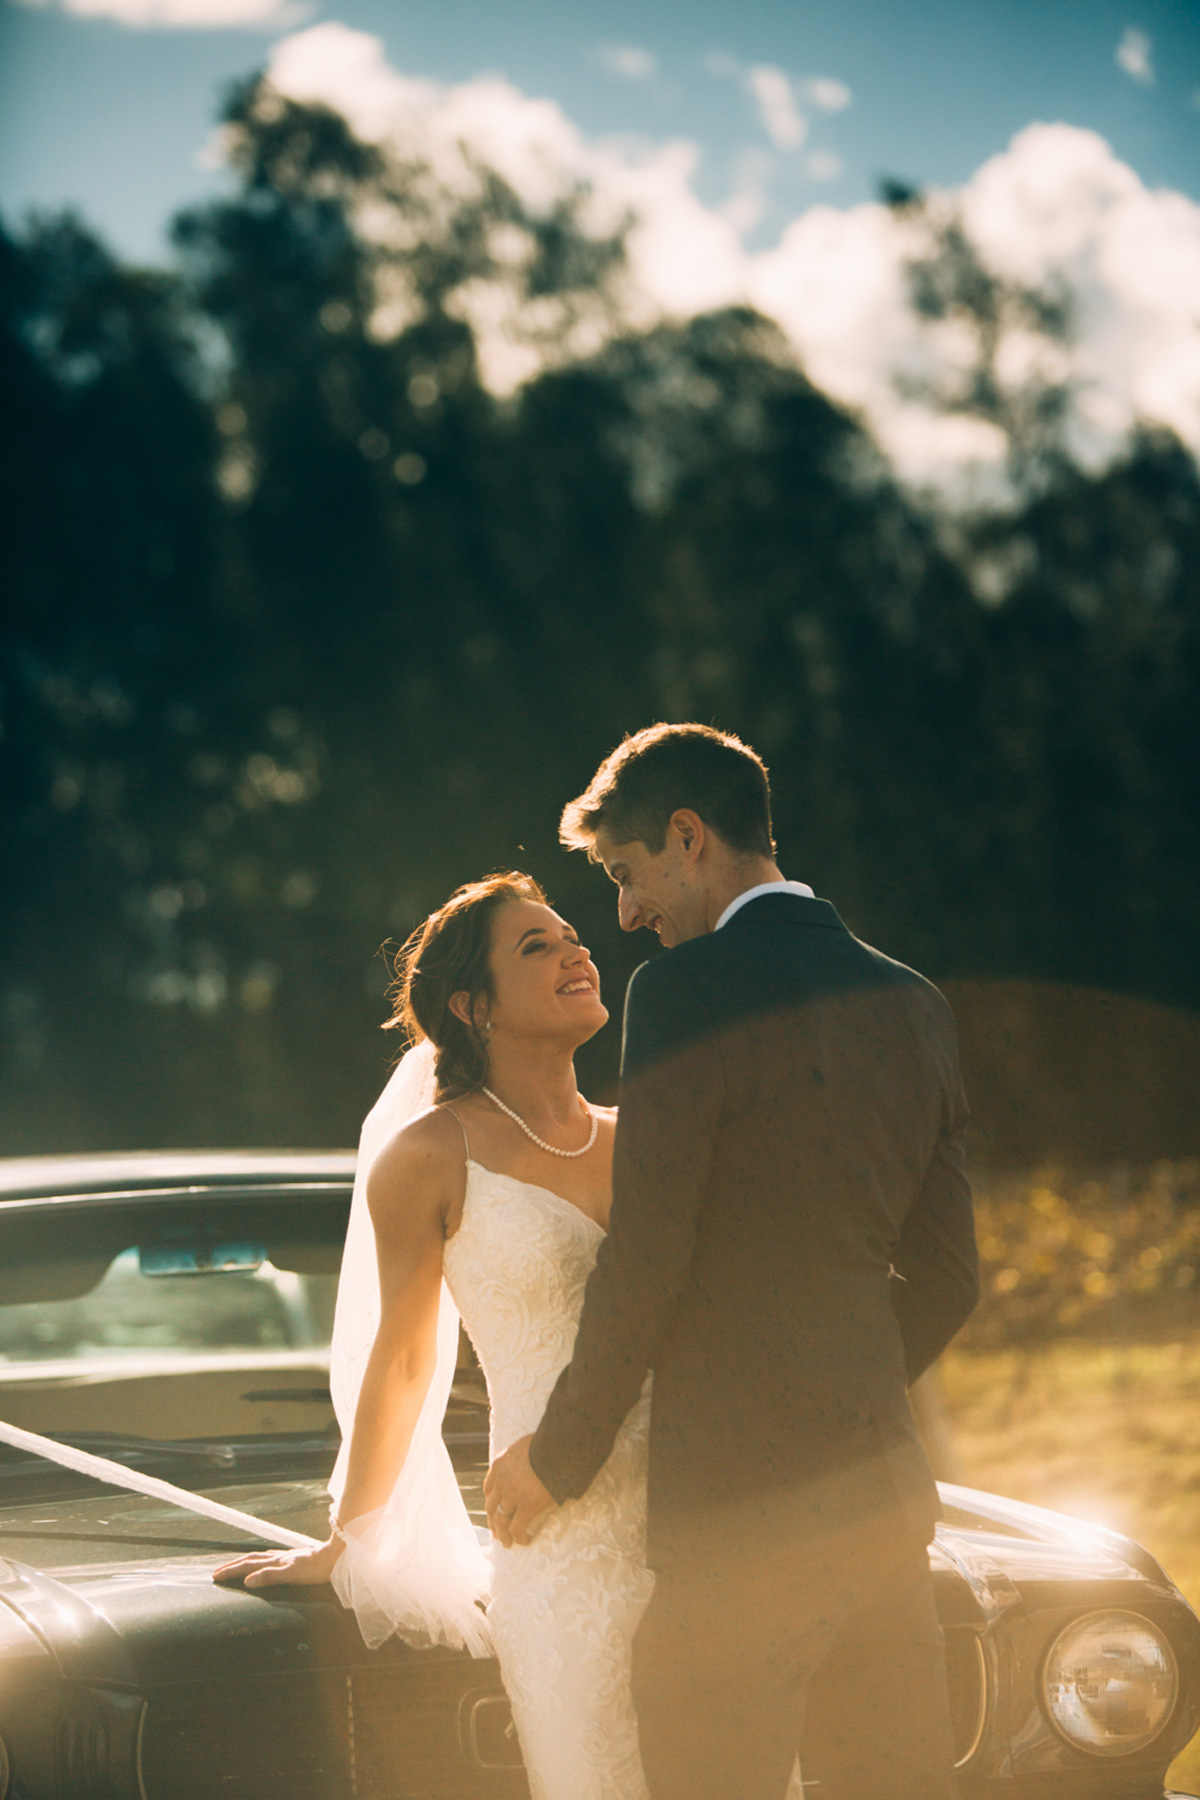 023-Sean-&-Kayleigh-Wedding